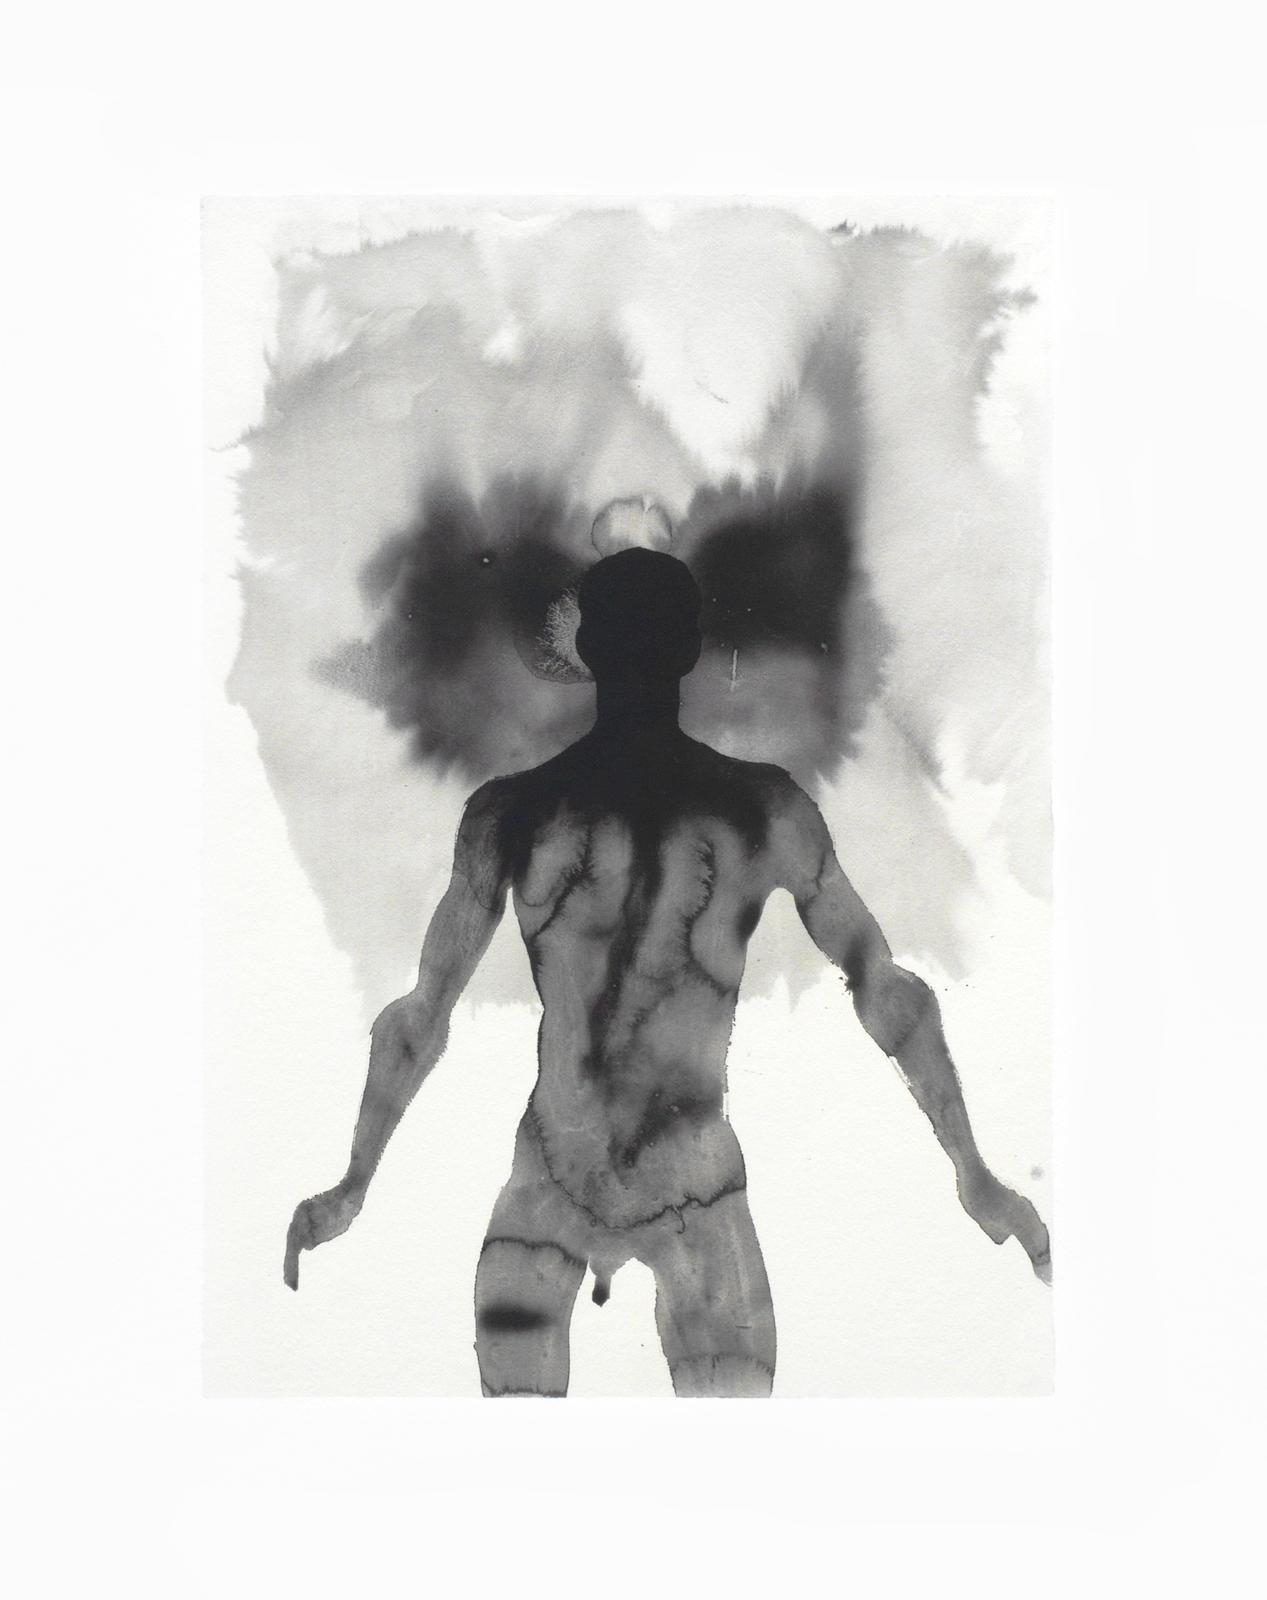 Antony Gormley-Body-2014